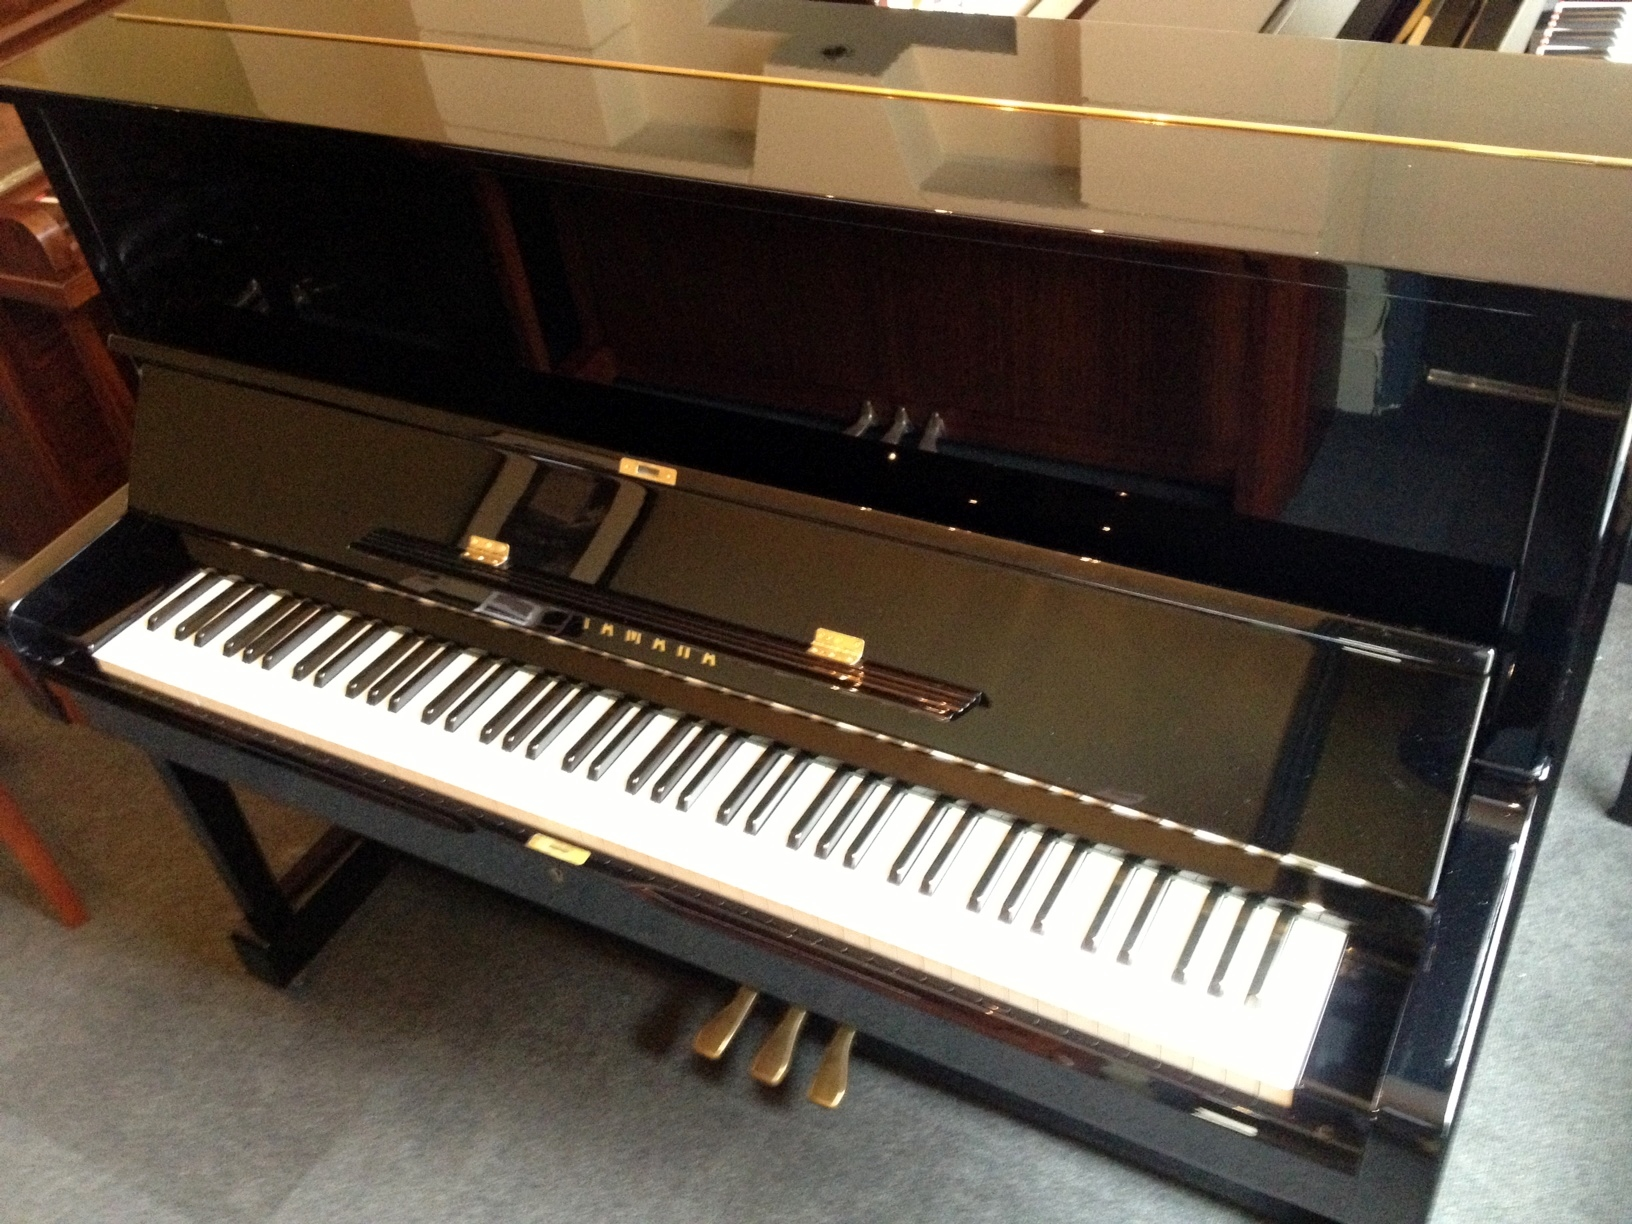 A Yamaha U1 piano in our showroom